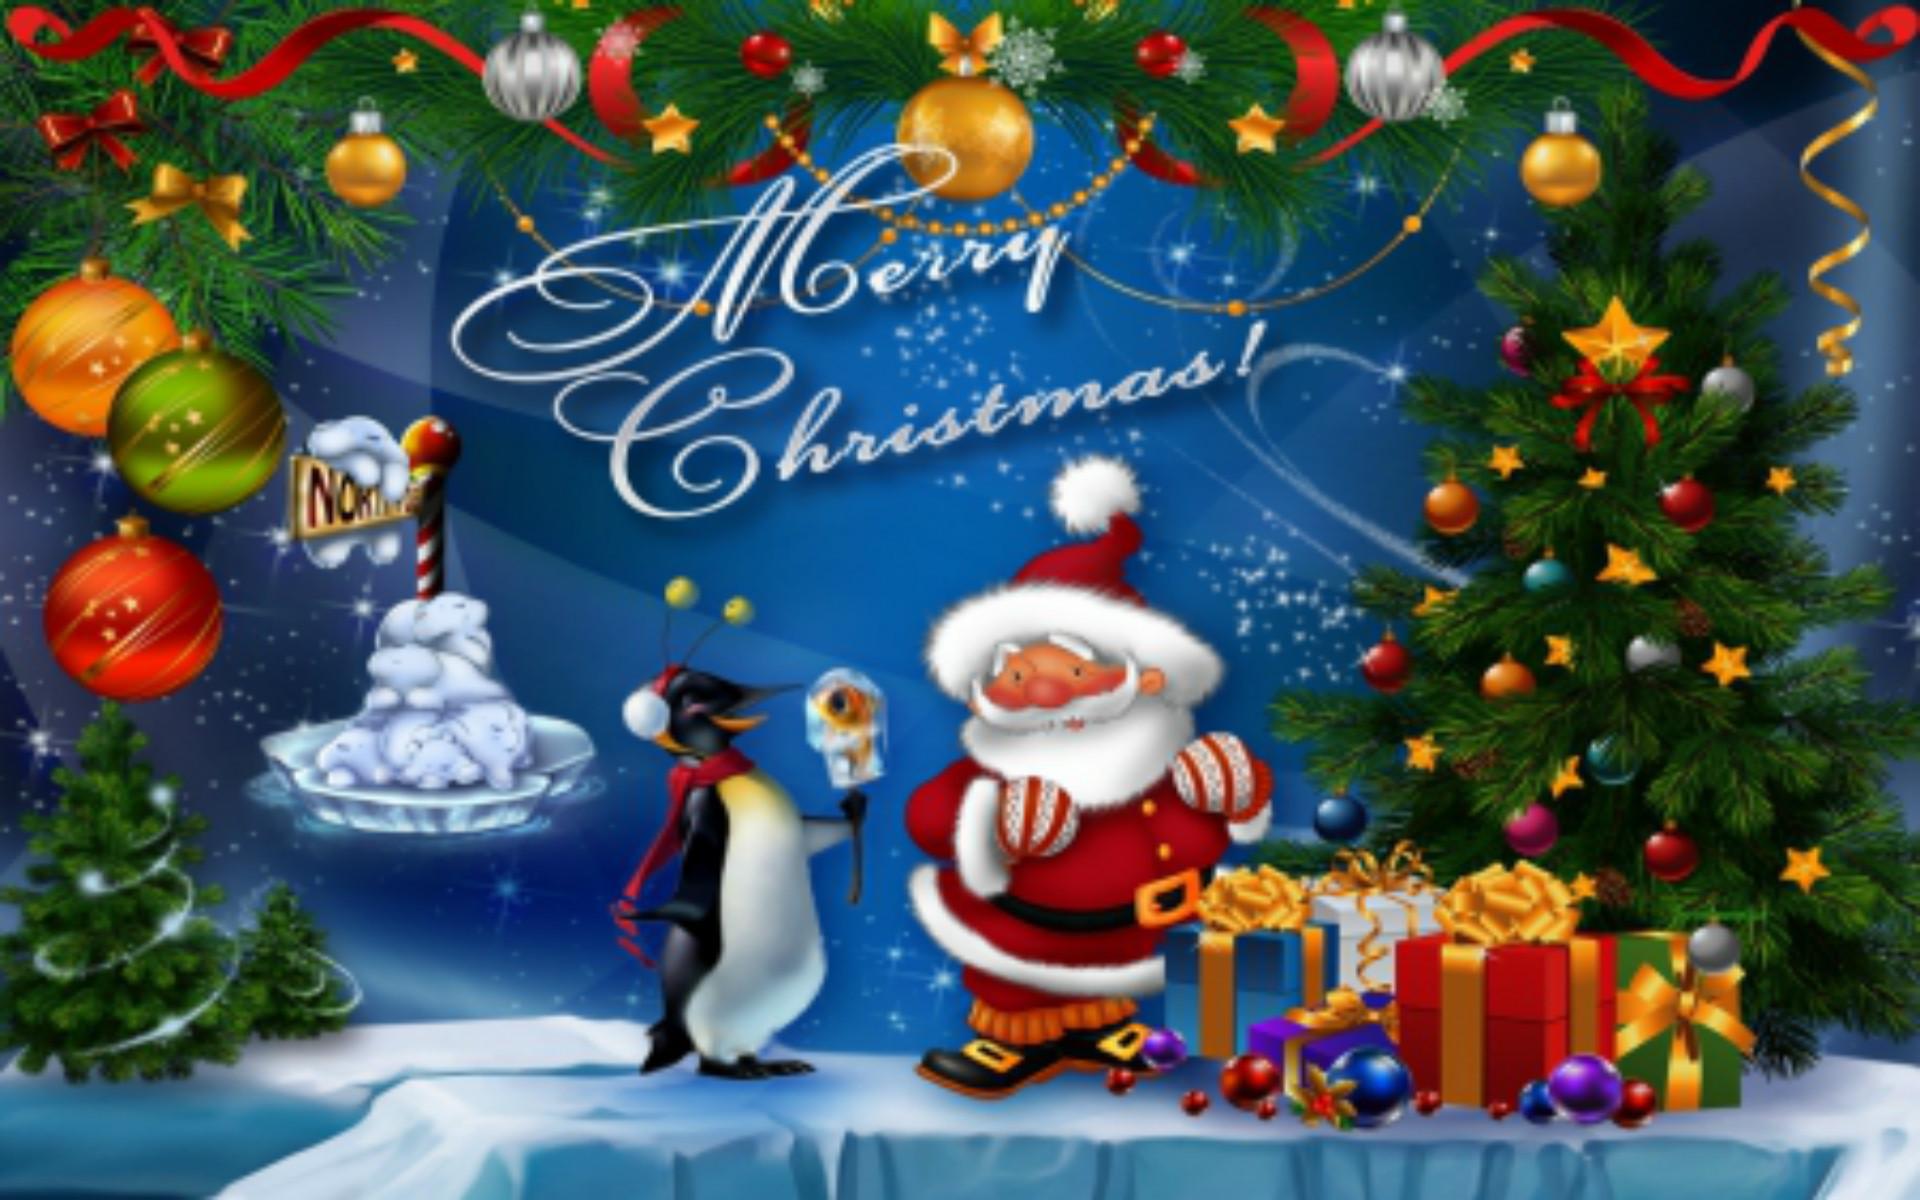 christmas background images christmas desktop wallpaper christmas tree  wallpaper free christmas wallpaper backgrounds merry christmas wallpaper  2016-11-07